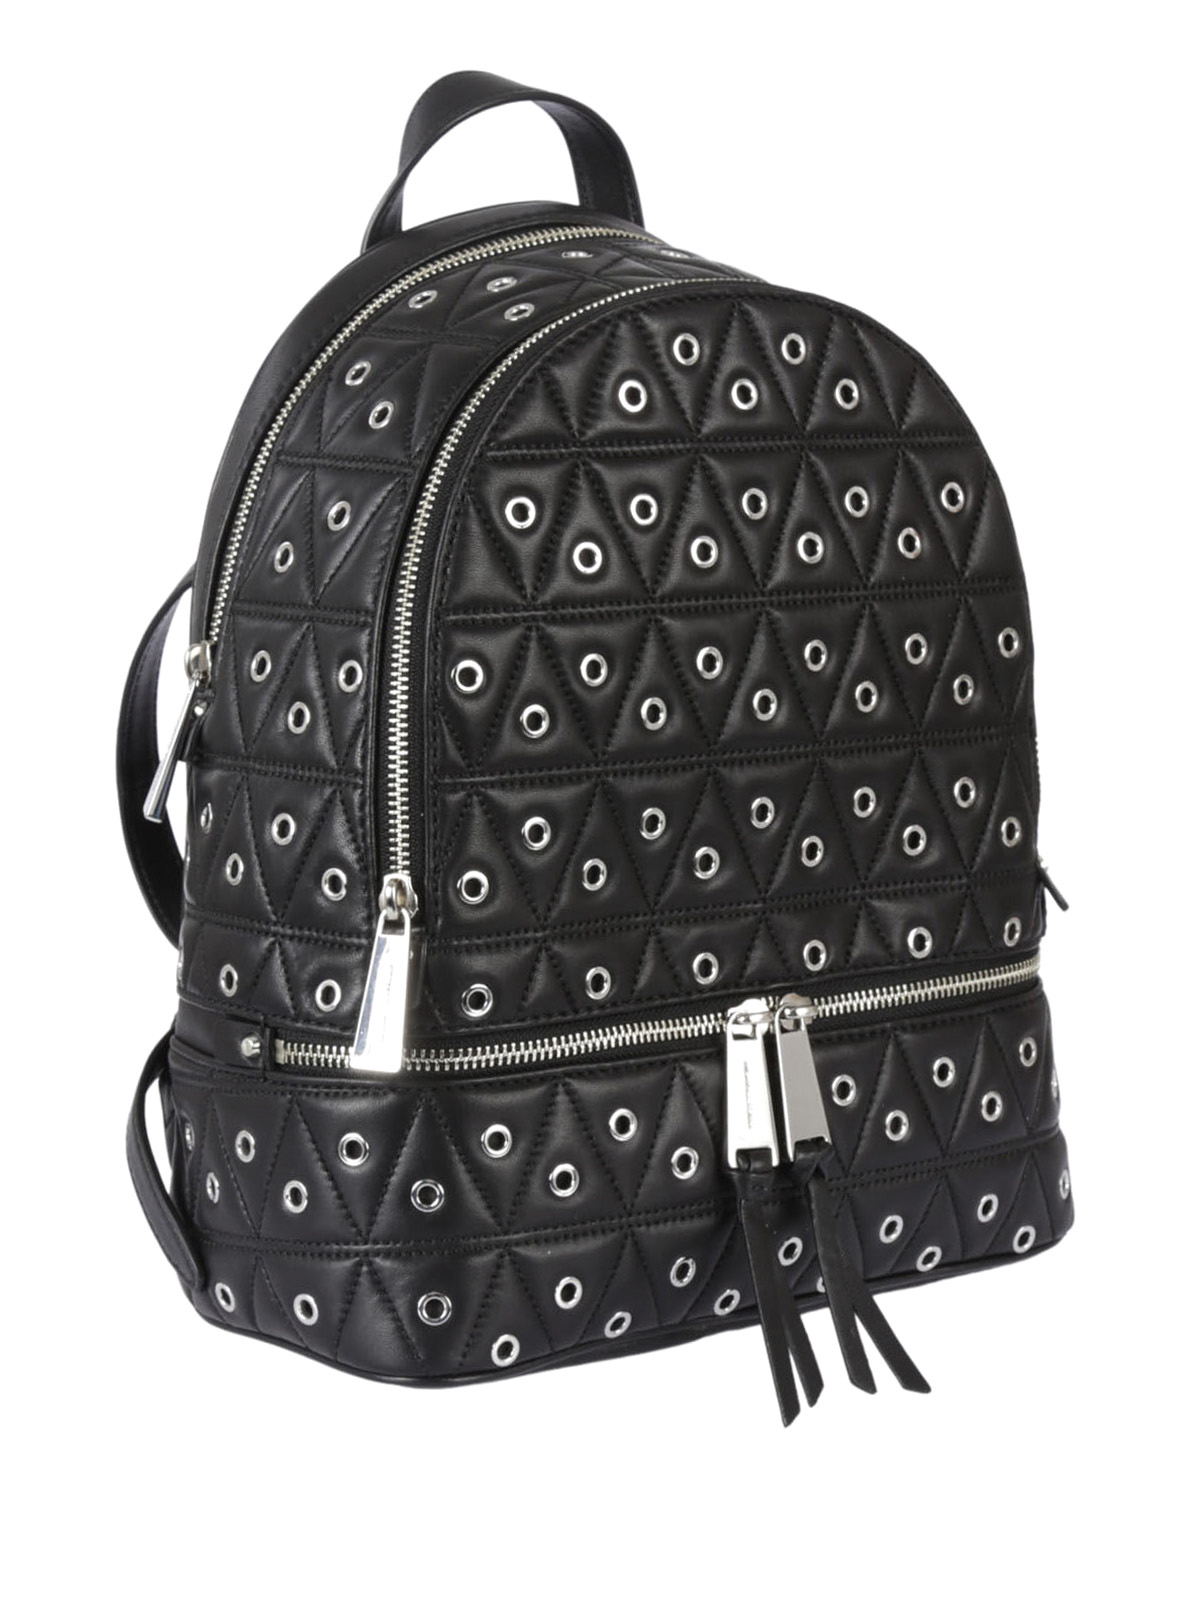 482f1ada61a779 Michael Kors - Rhea eyelet black backpack - backpacks - 30F7SEZB2L001